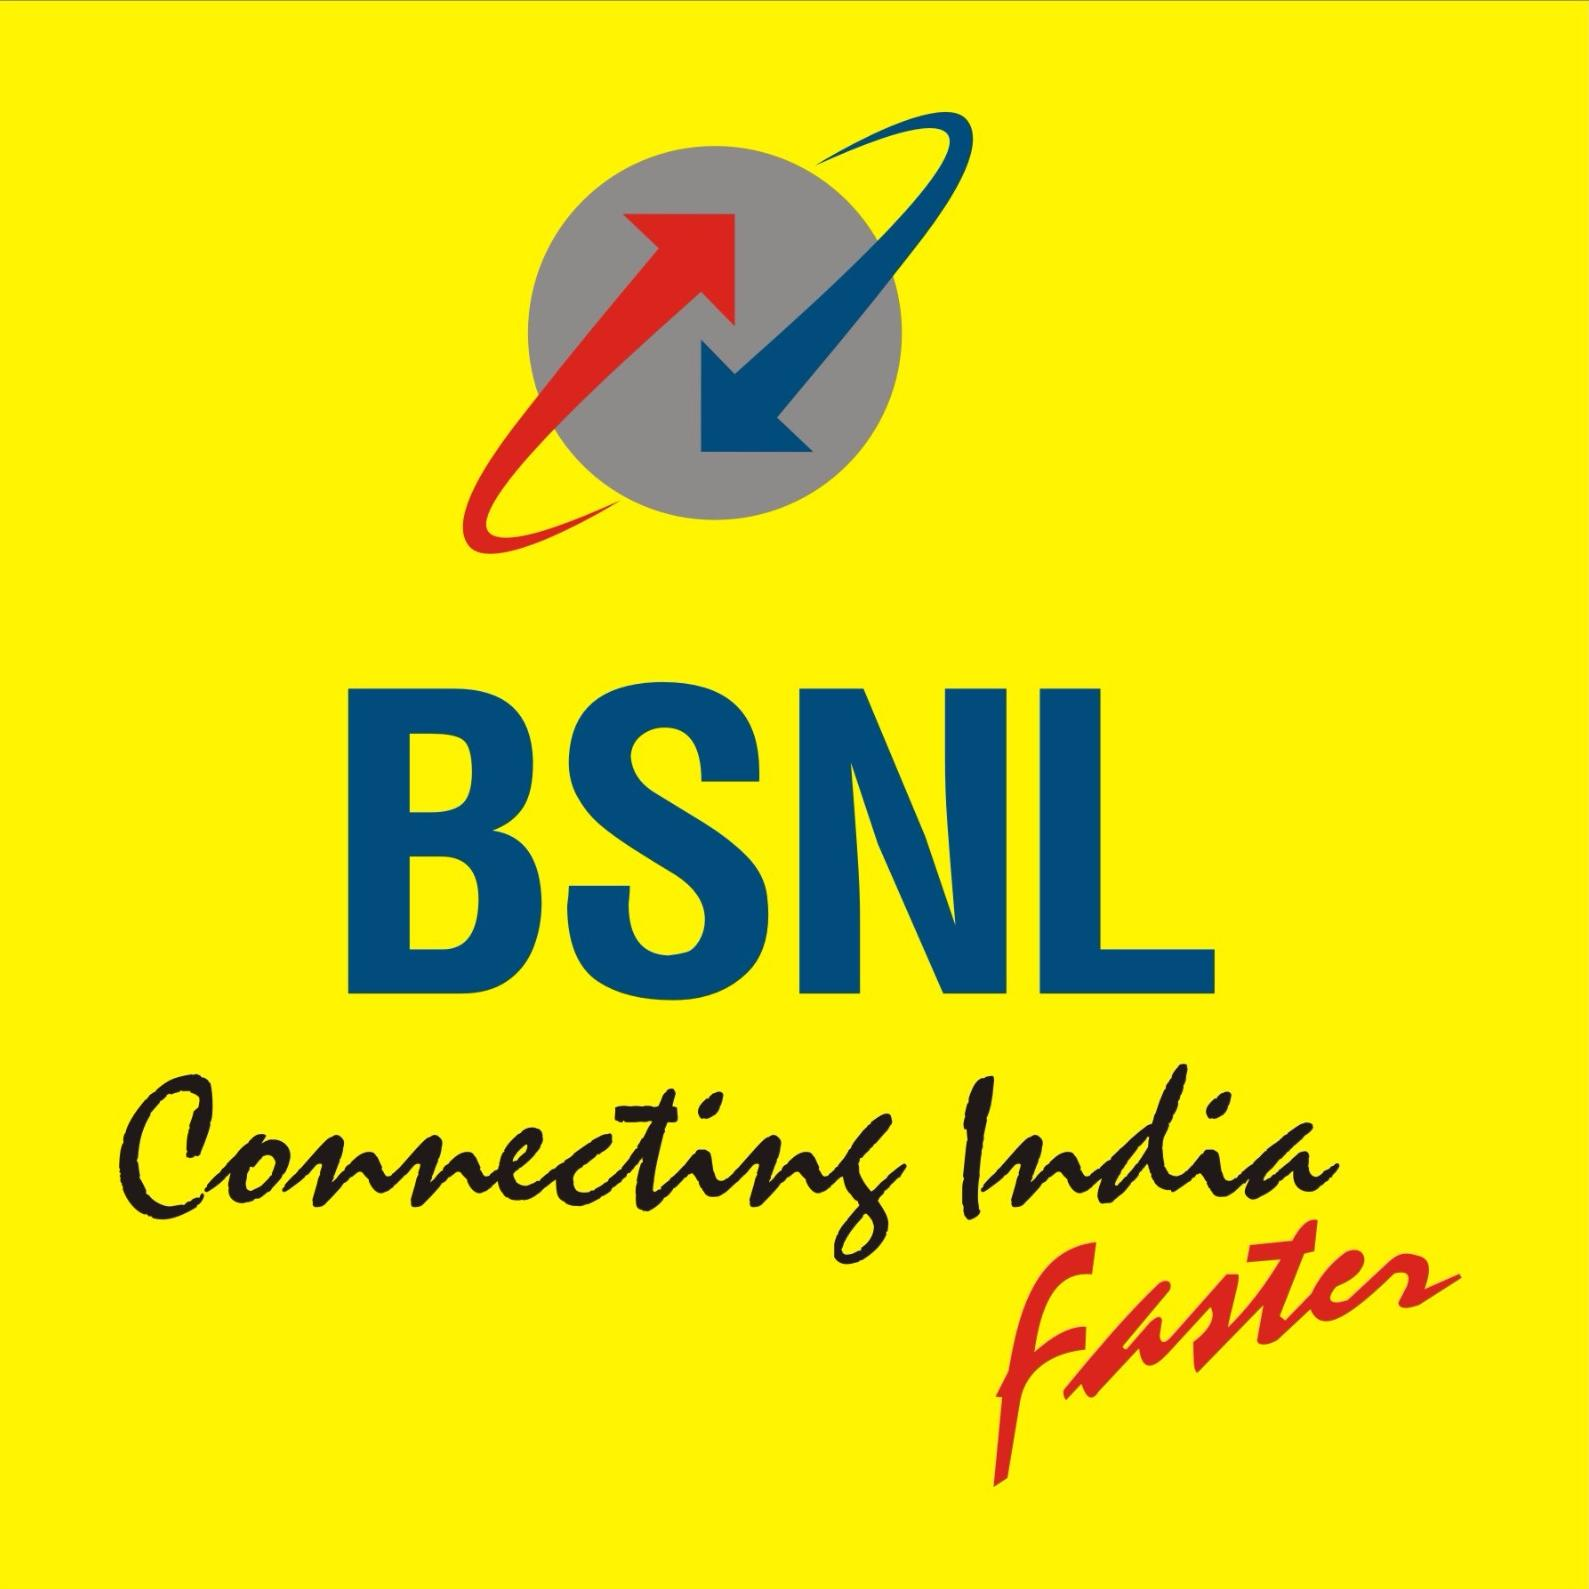 BSNL Logo   Bharat Sanchar Nigam Limited